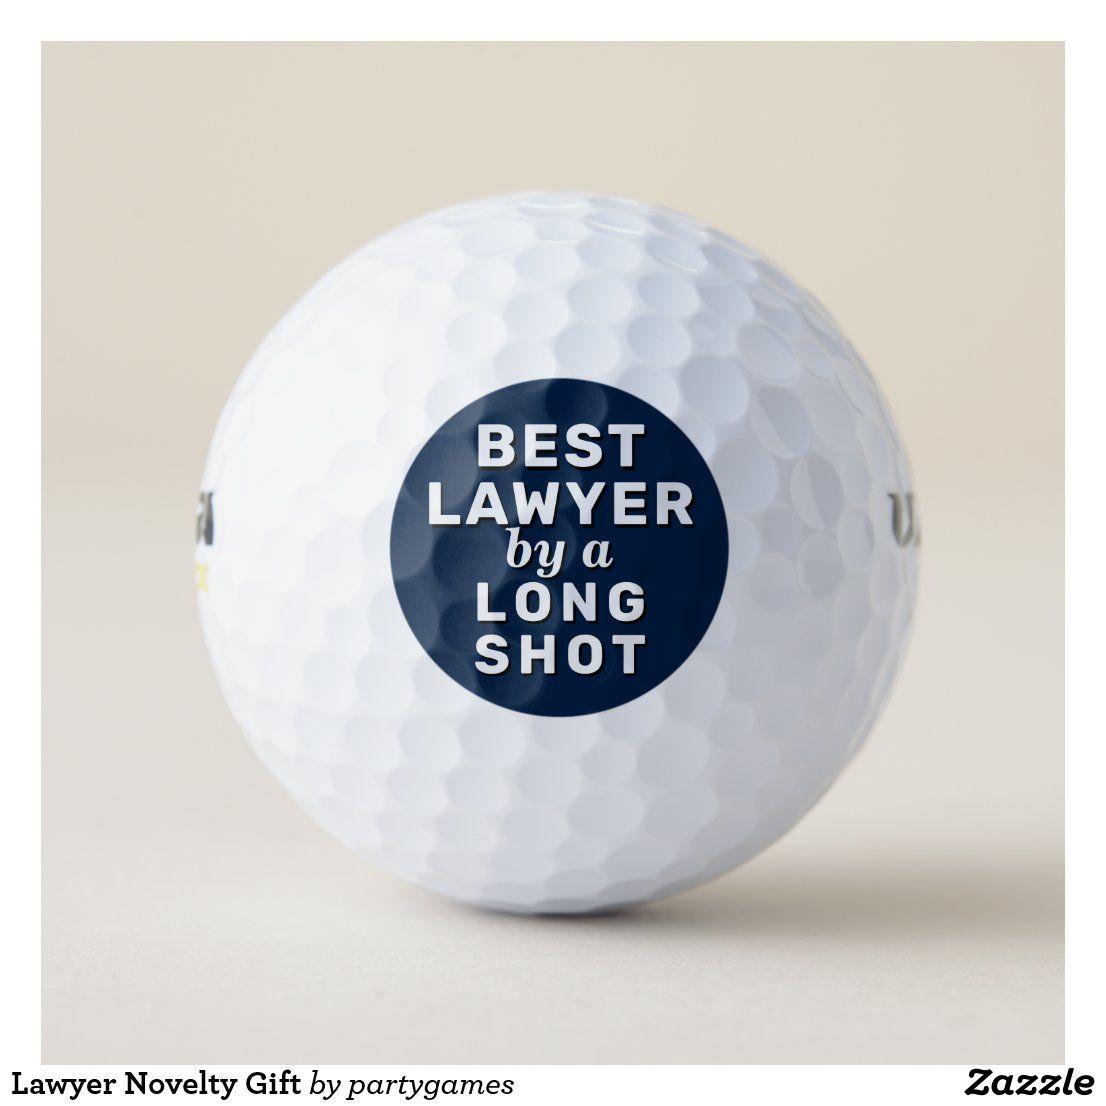 Lawyer Novelty Gift Golf Balls | Zazzle.com | Golf ball, Gifts for dentist,  Golf ball gift